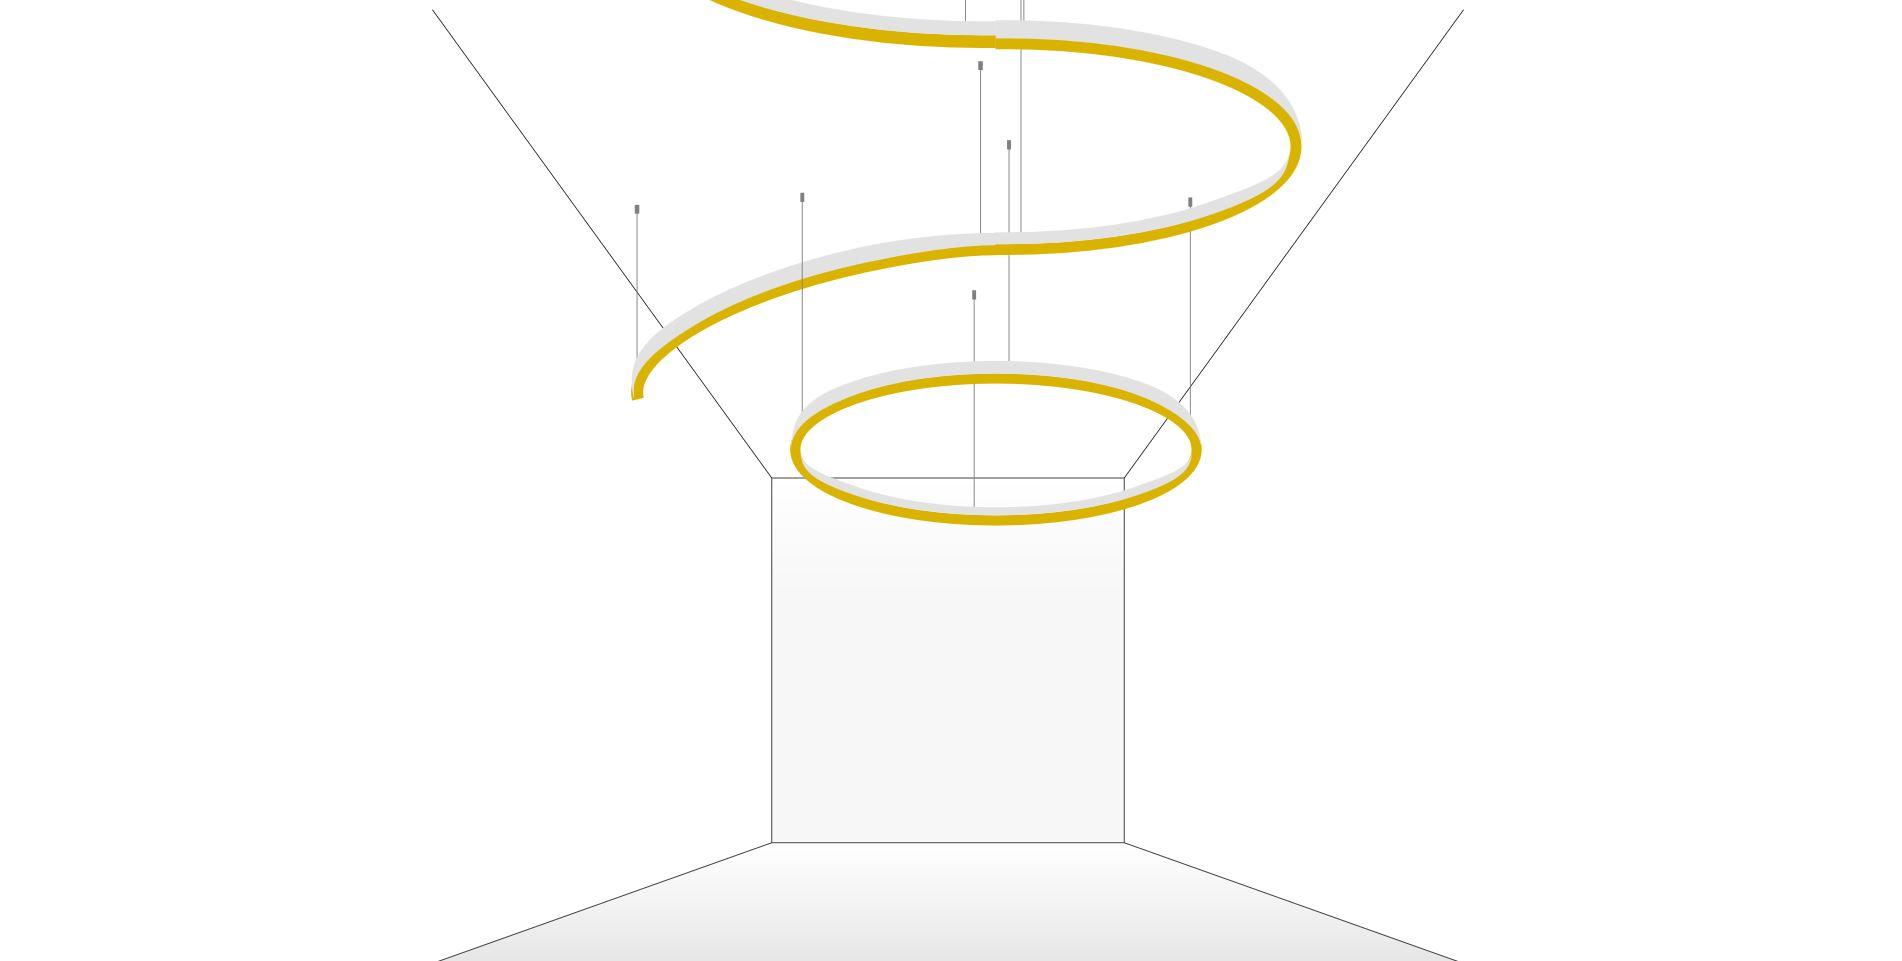 SML LED Ringleuchte Loyd Beispiel Anwendung